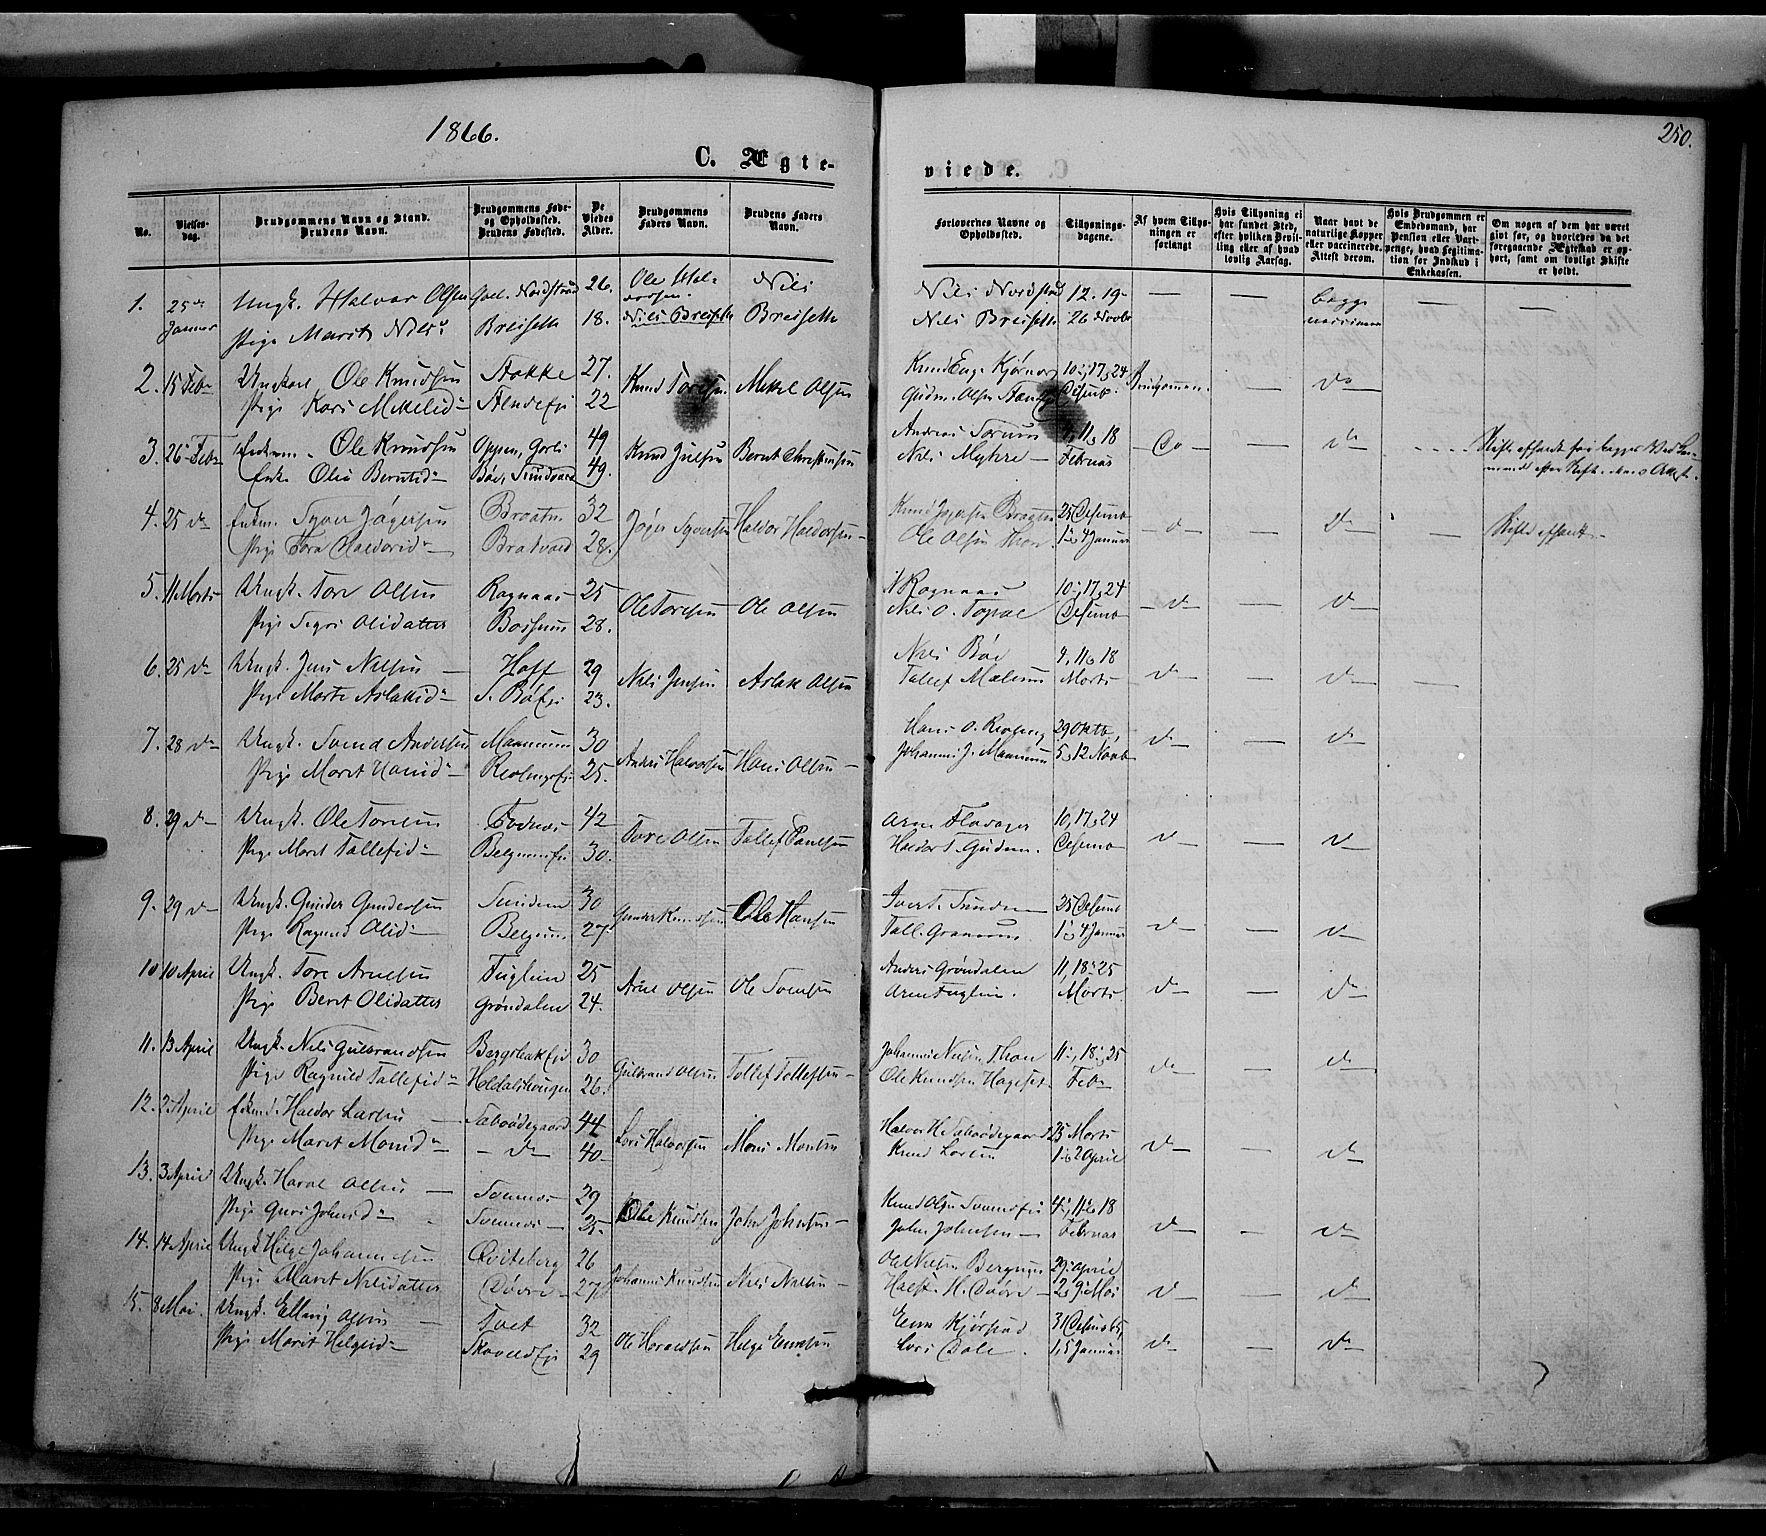 SAH, Nord-Aurdal prestekontor, Ministerialbok nr. 8, 1863-1875, s. 250